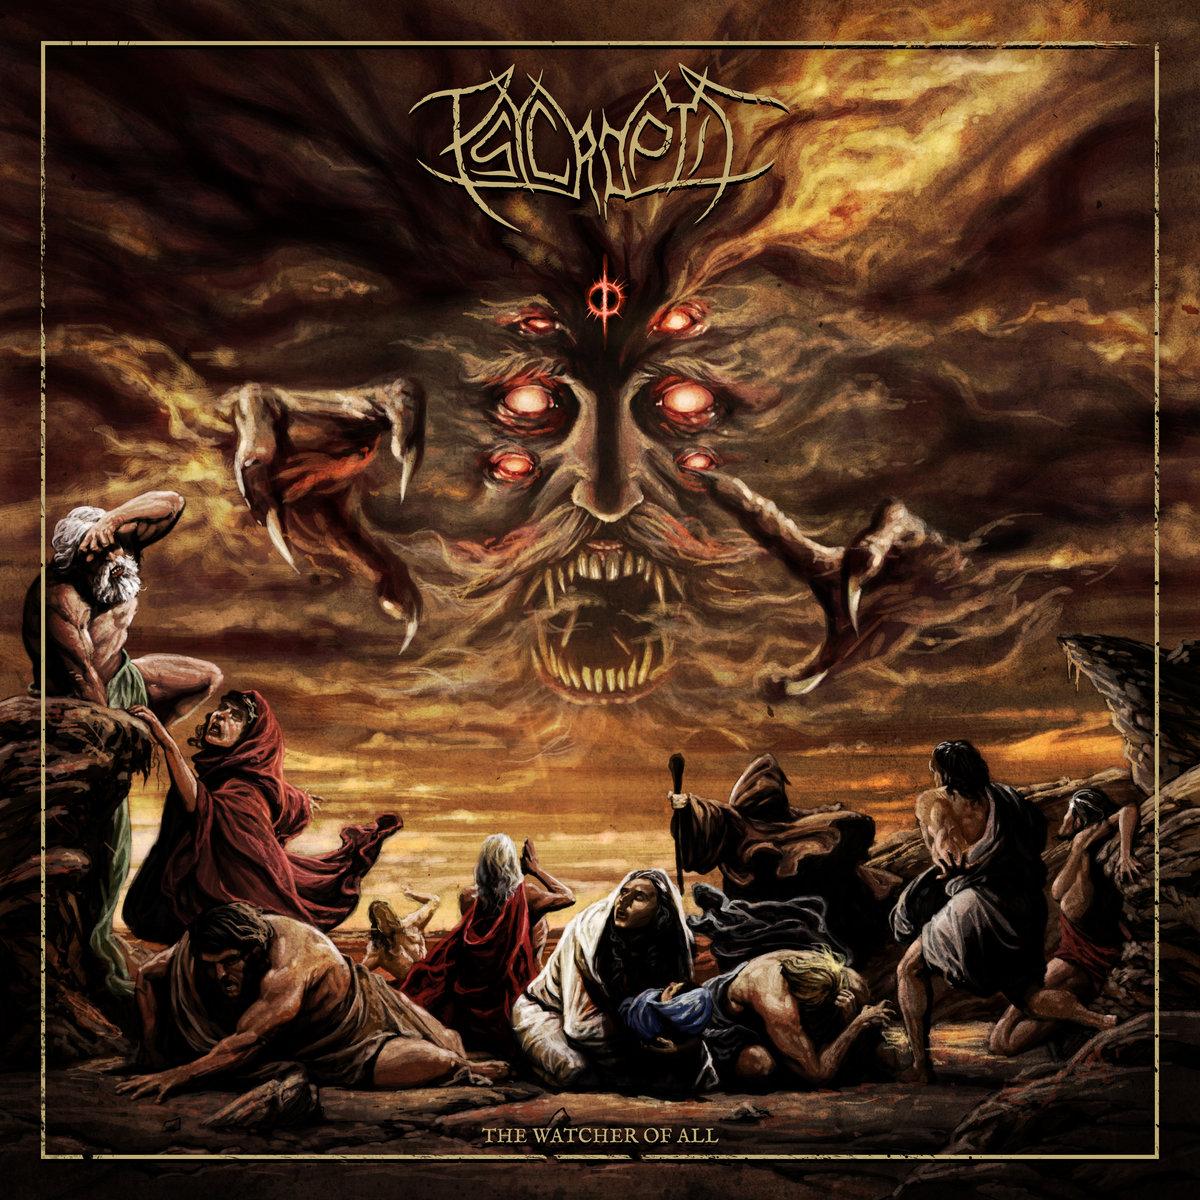 psycroptic the watcher of all album cover artwork 2020